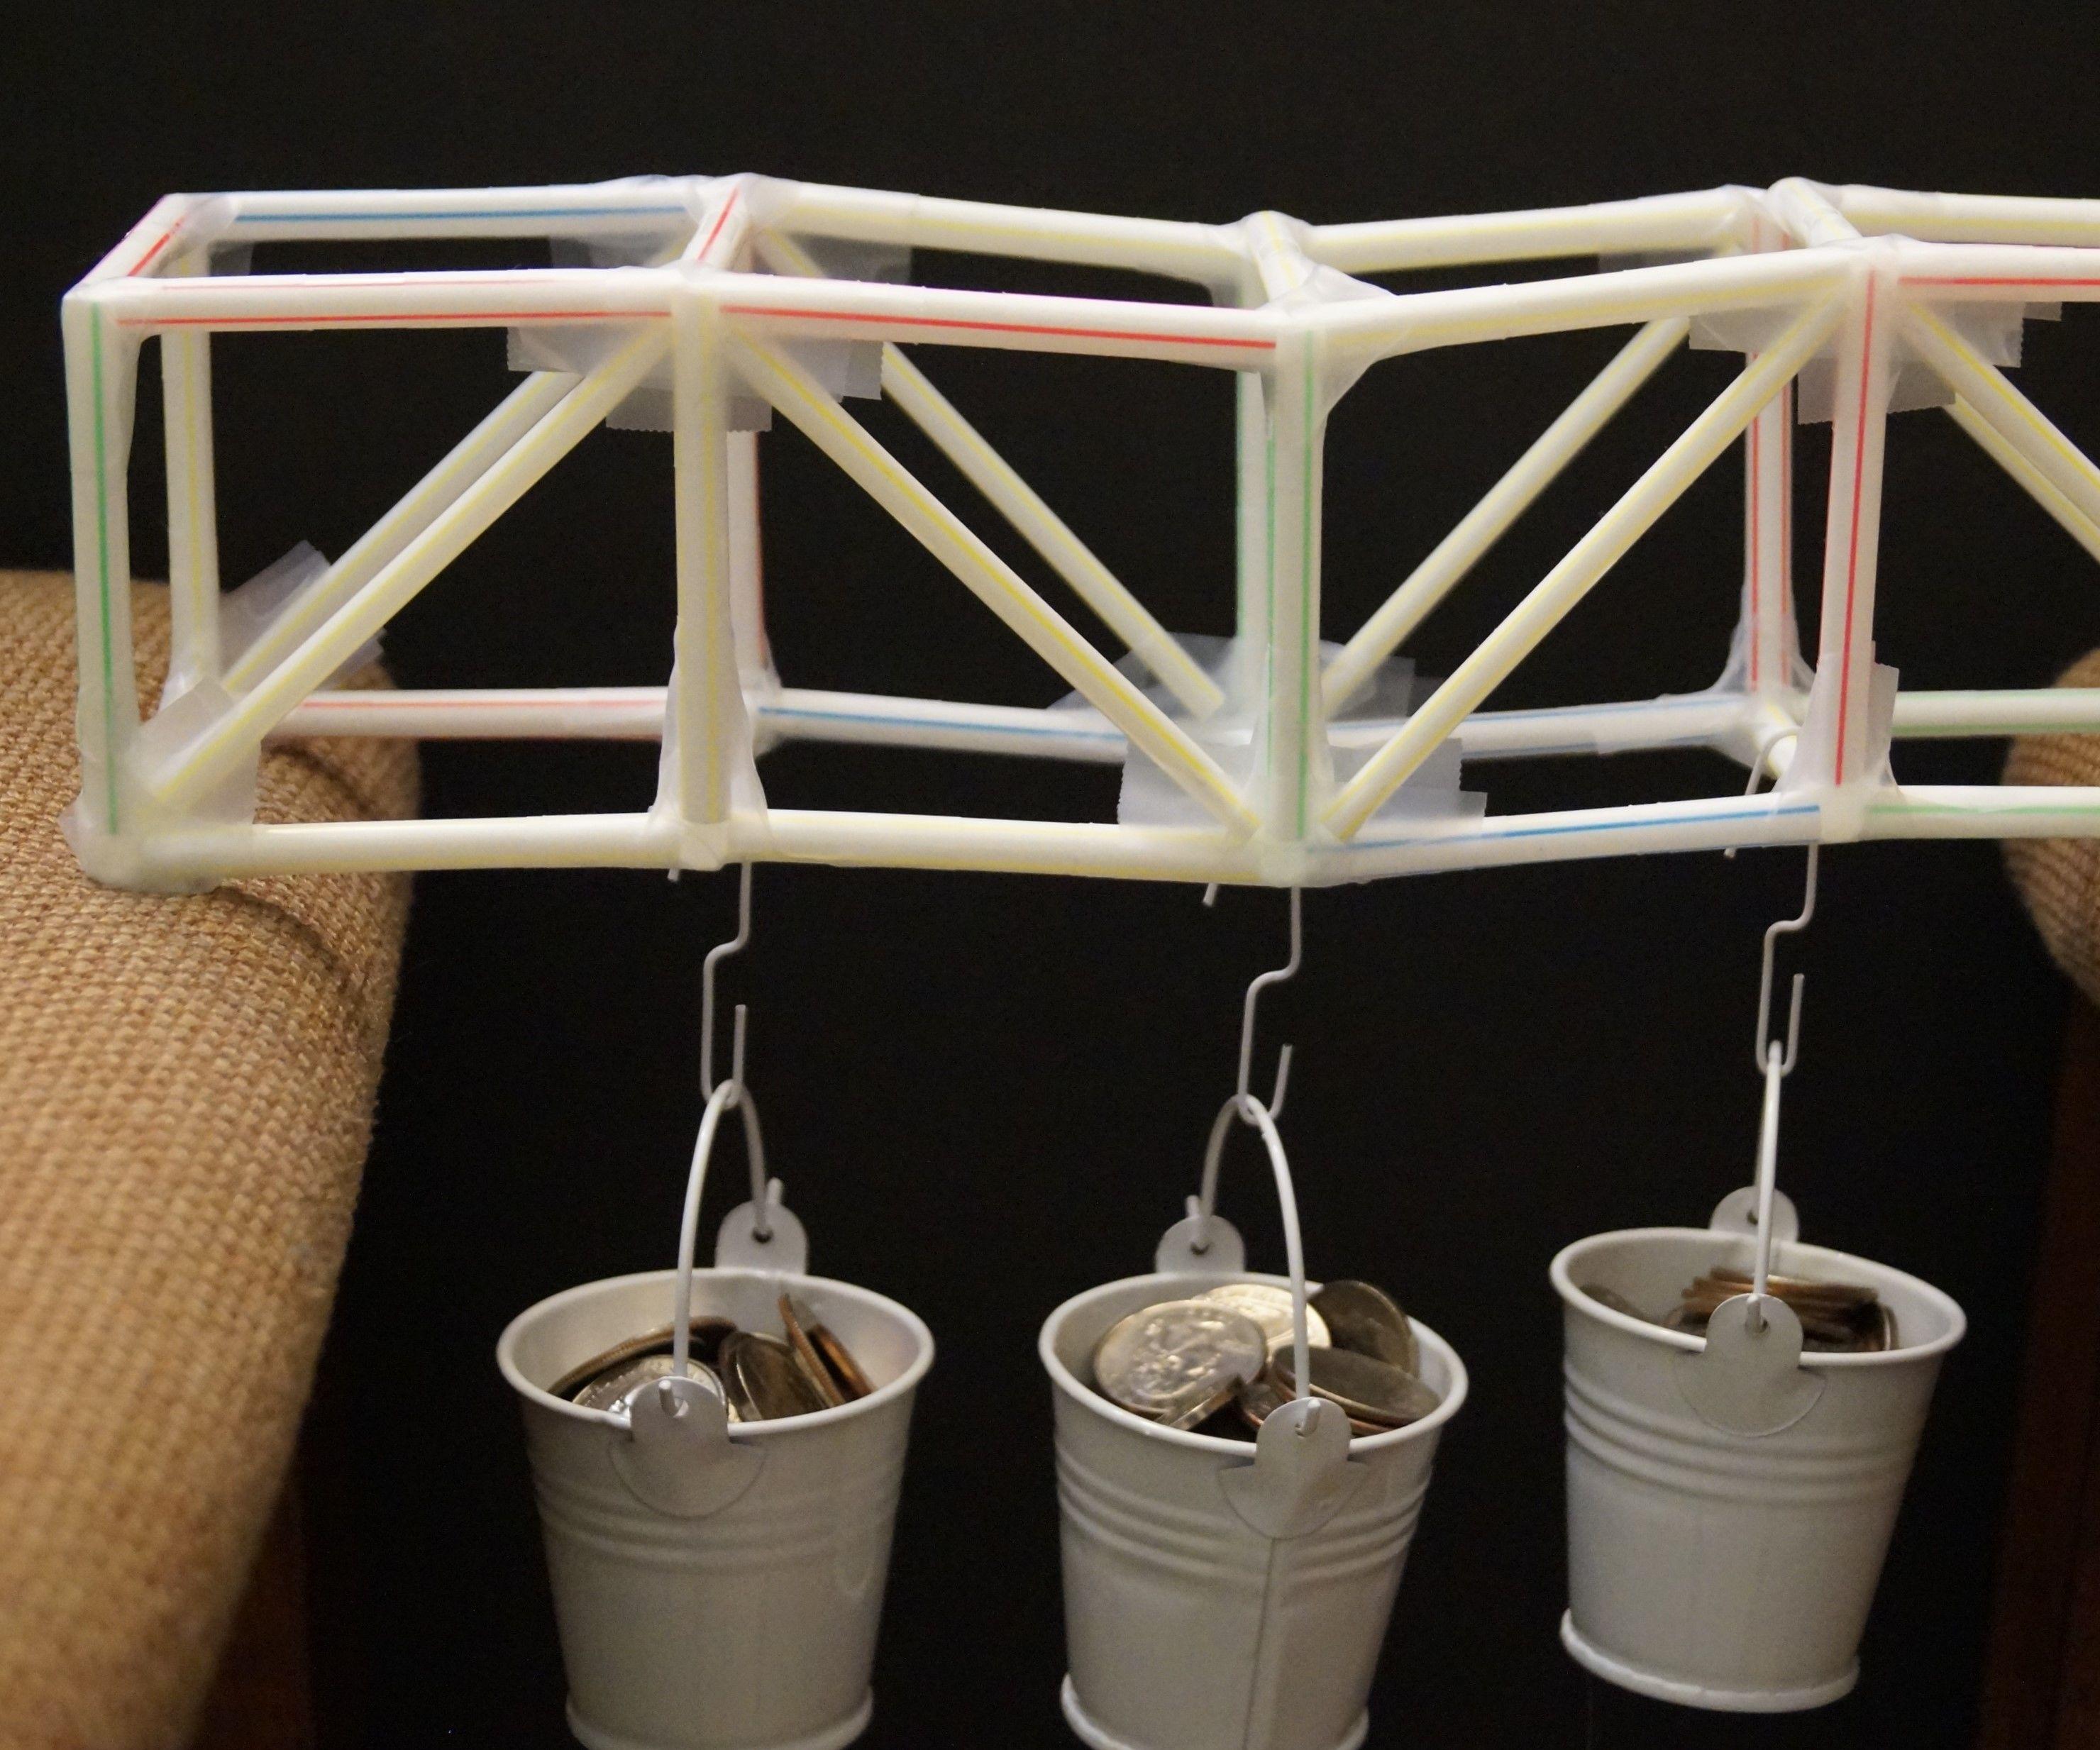 Truss Bridge 2 – Straws & tape (A challenge project)